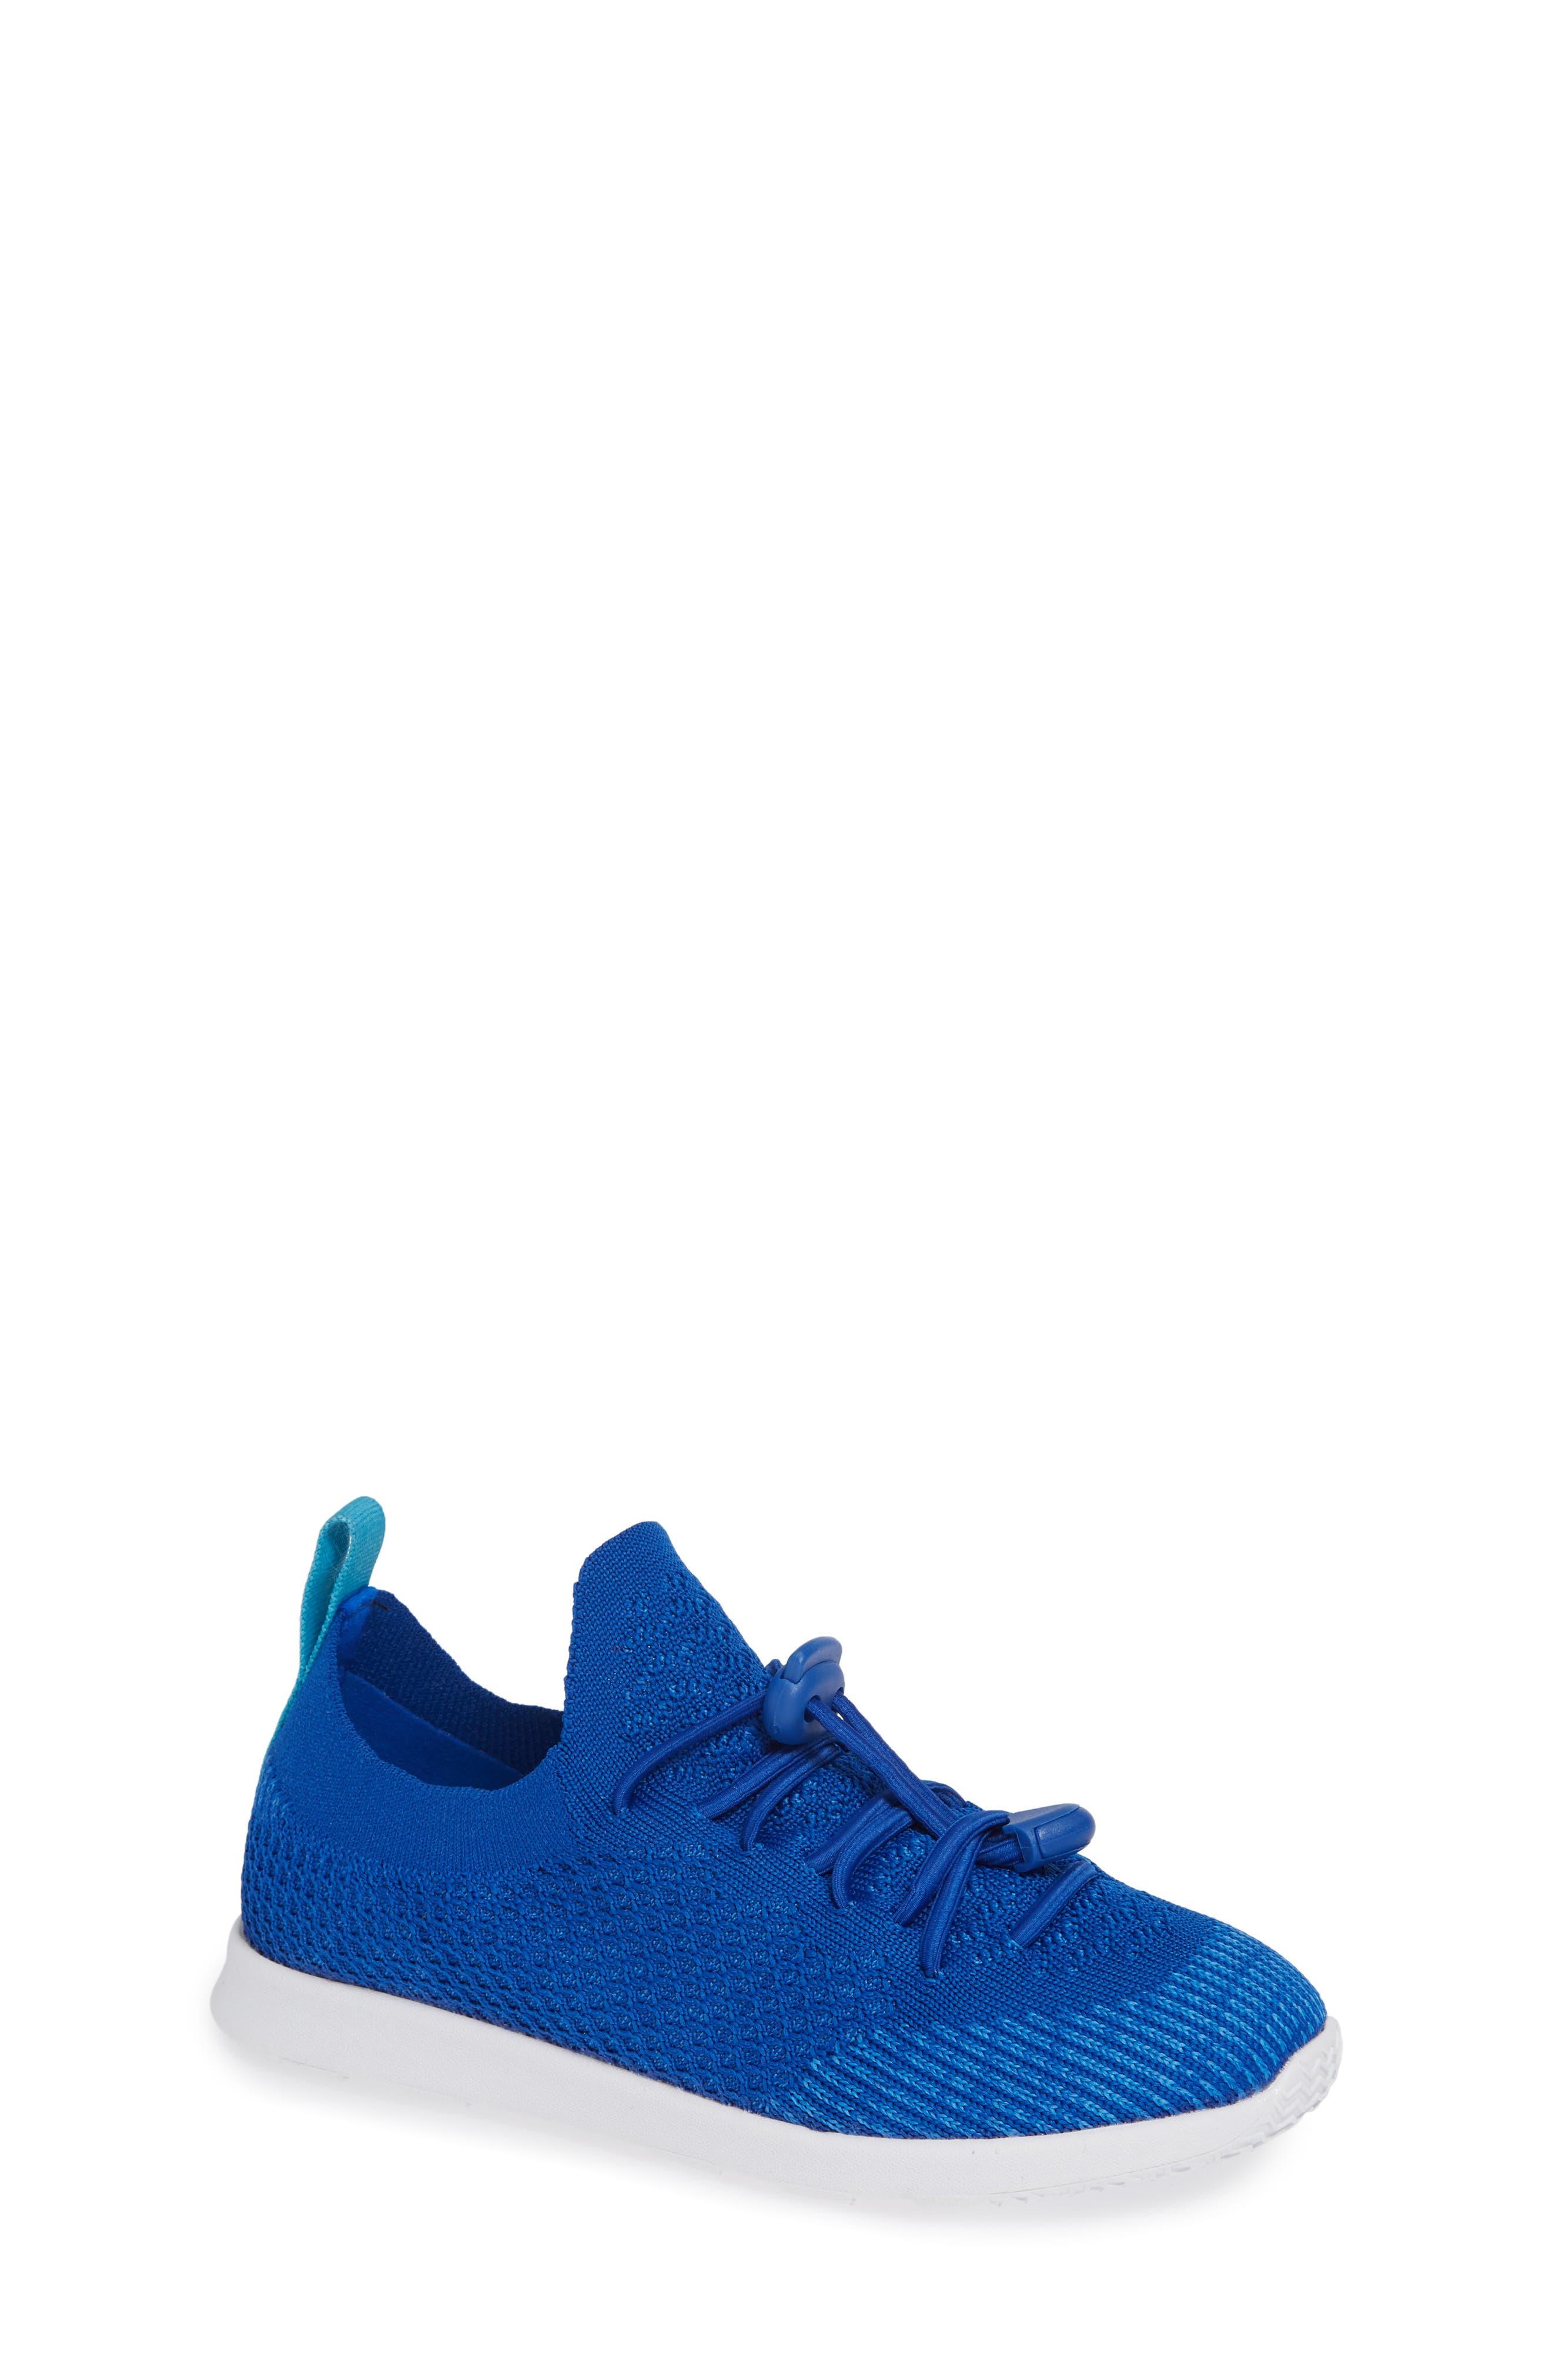 AP Mercury LiteKnit Sneaker,                             Main thumbnail 1, color,                             VICTORIA BLUE/ SHELL WHITE